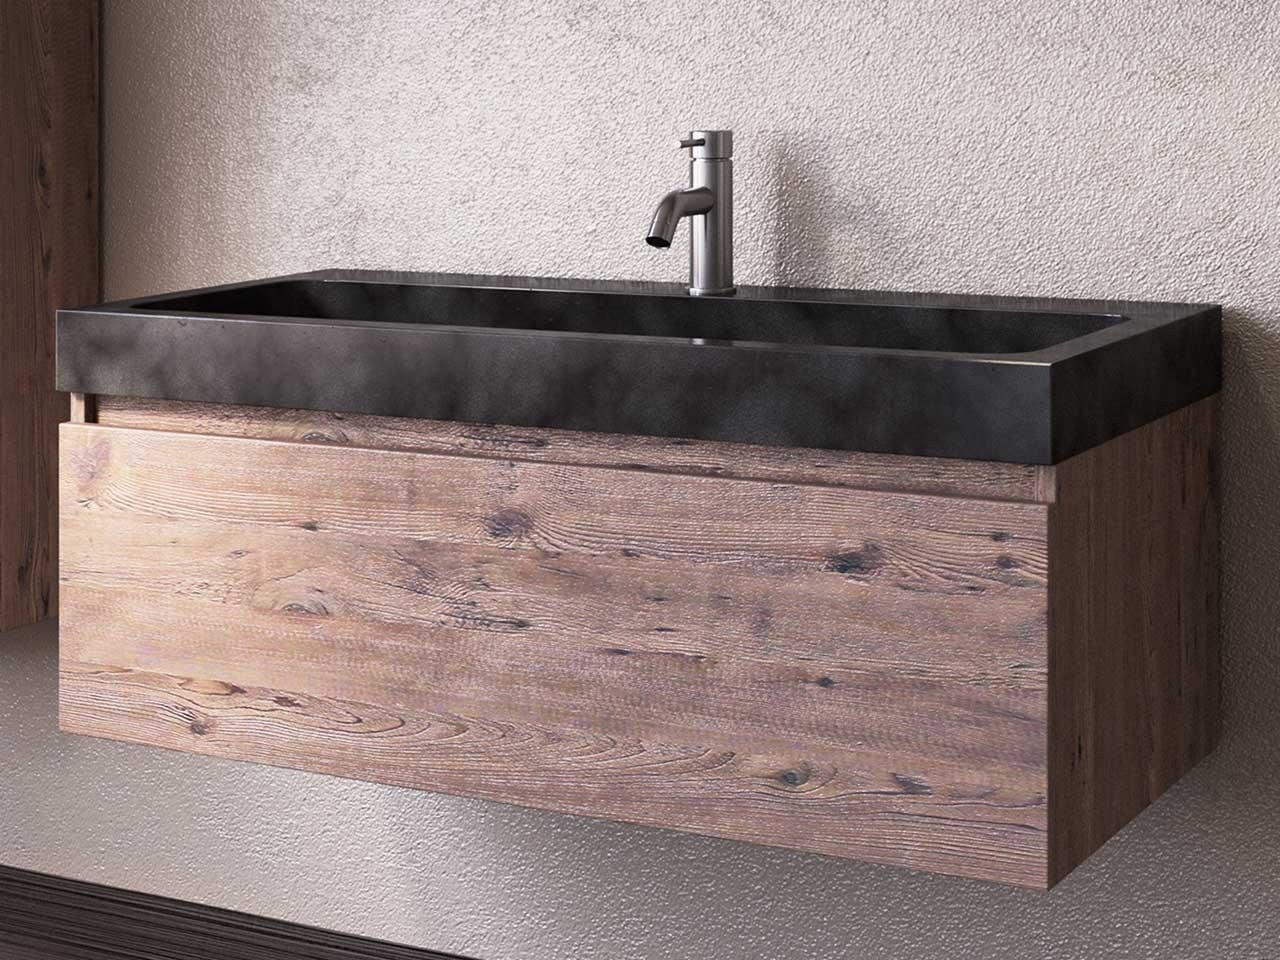 emejing lavabo in pietra prezzi photos amazing house. Black Bedroom Furniture Sets. Home Design Ideas